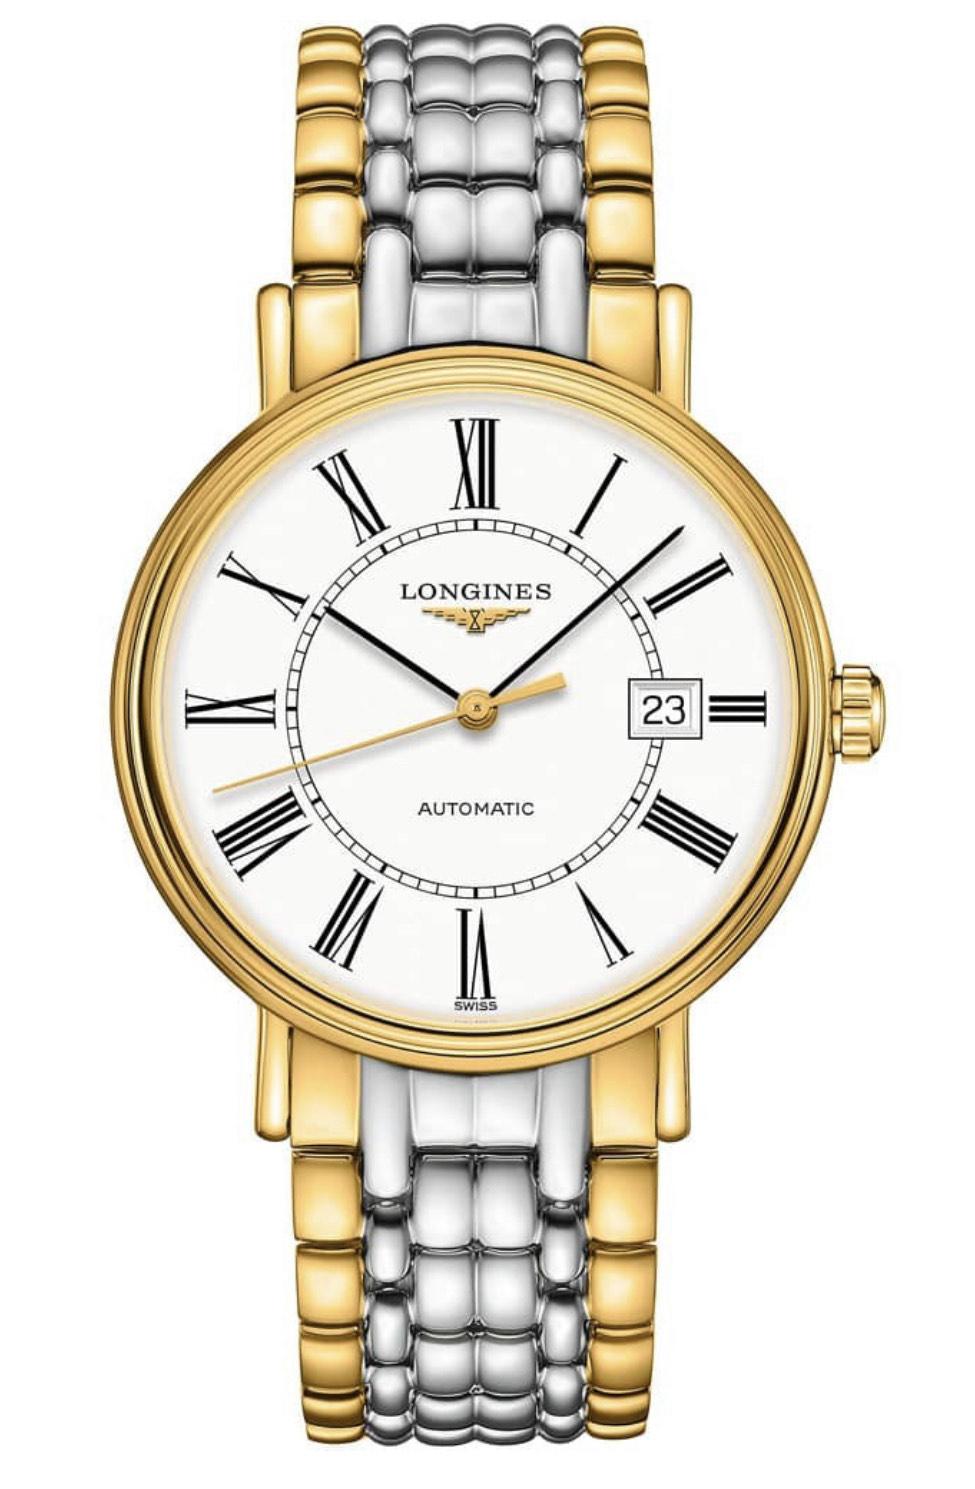 Longines Presence Men's Swiss Automatic 40mm Two Tone Bracelet Watch £731 at Ernest Jones